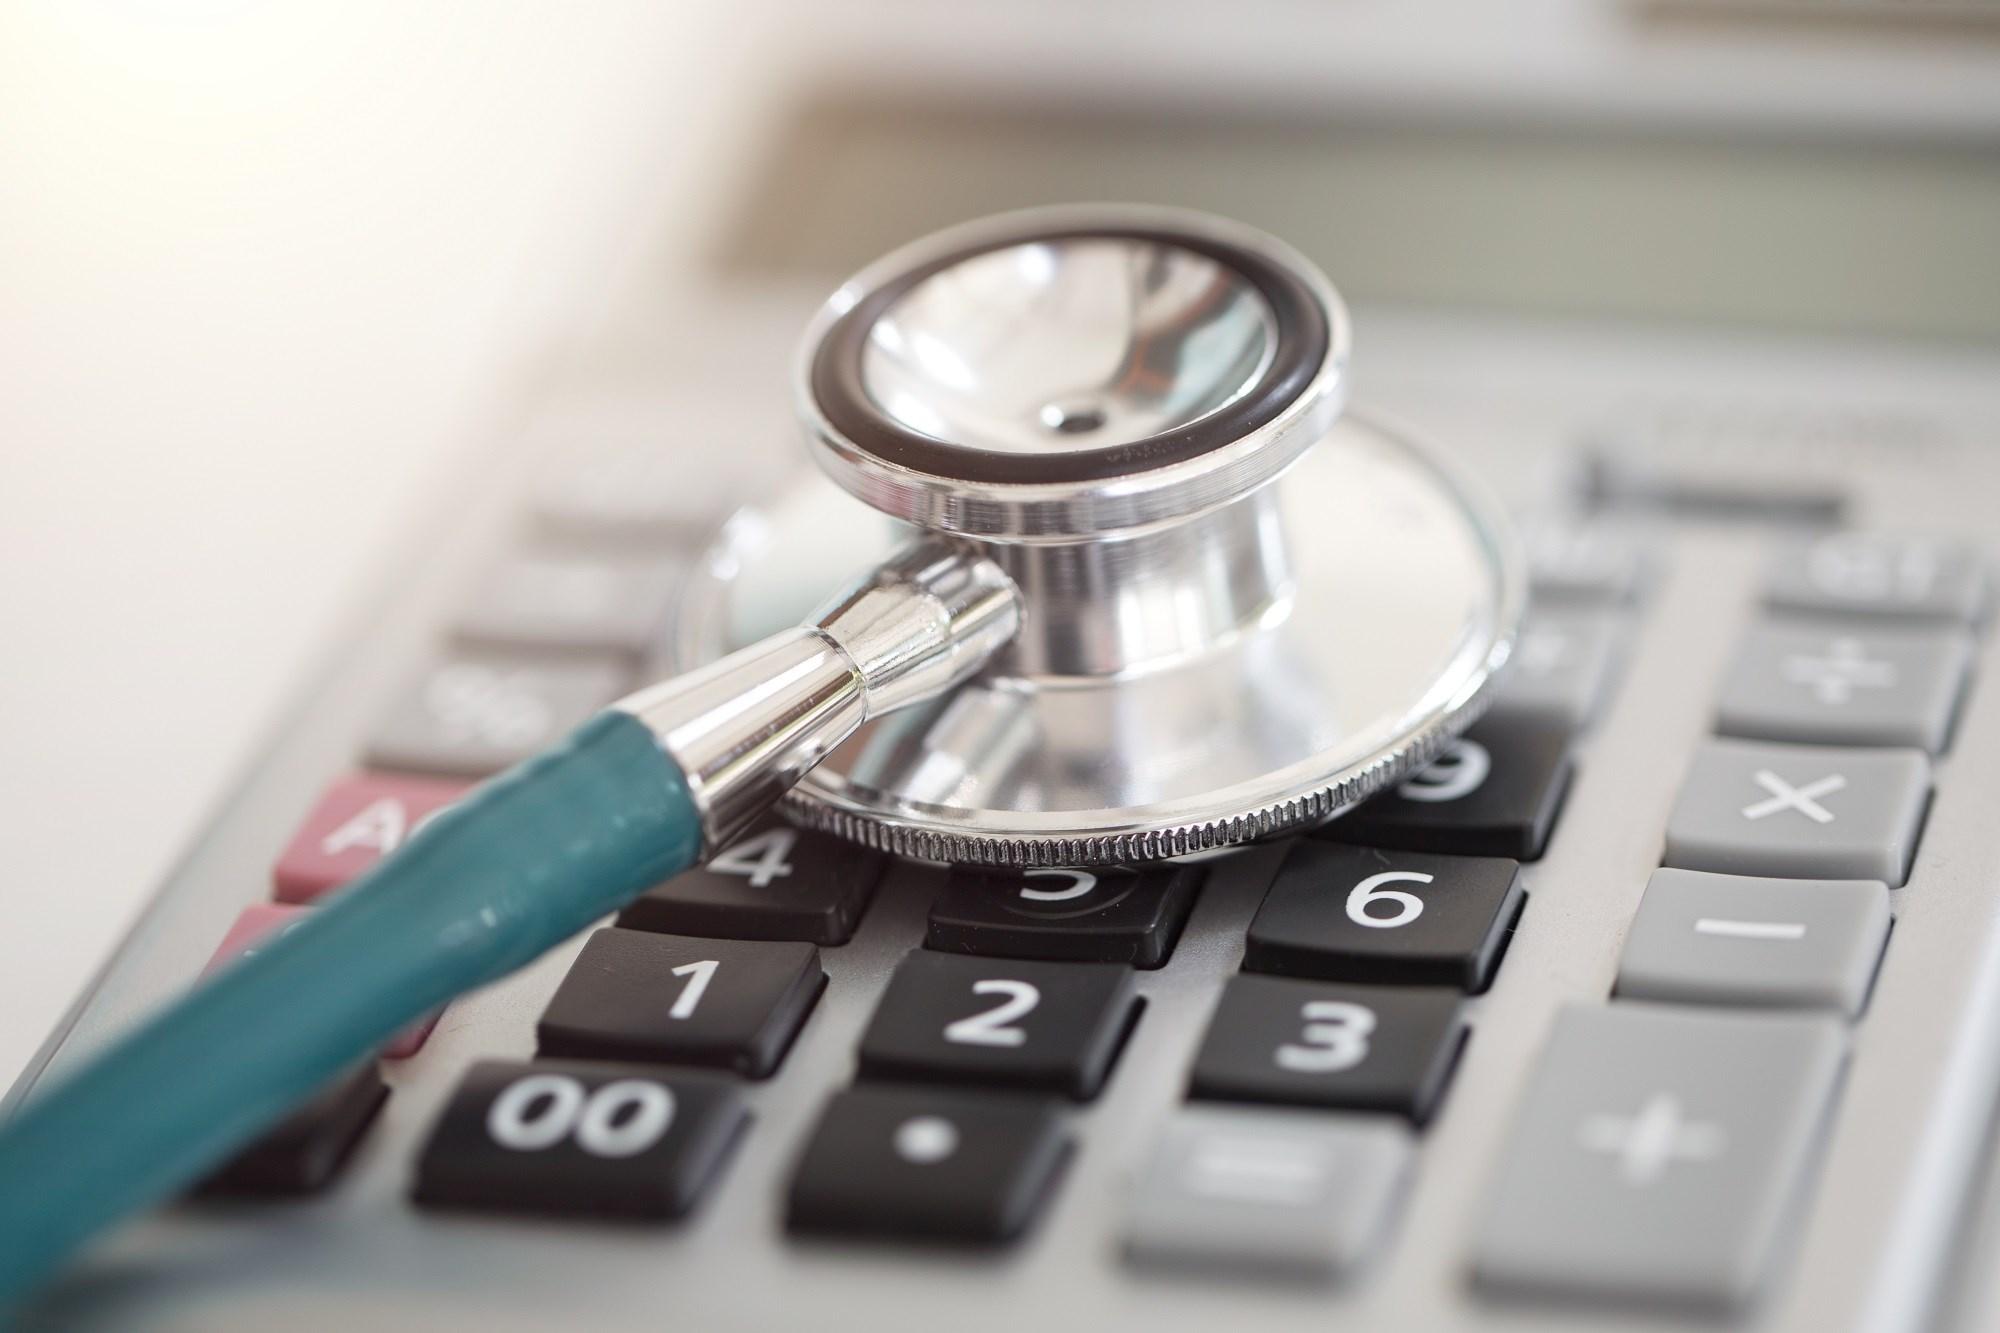 Prices Still Explain High U.S. Health Care Spending